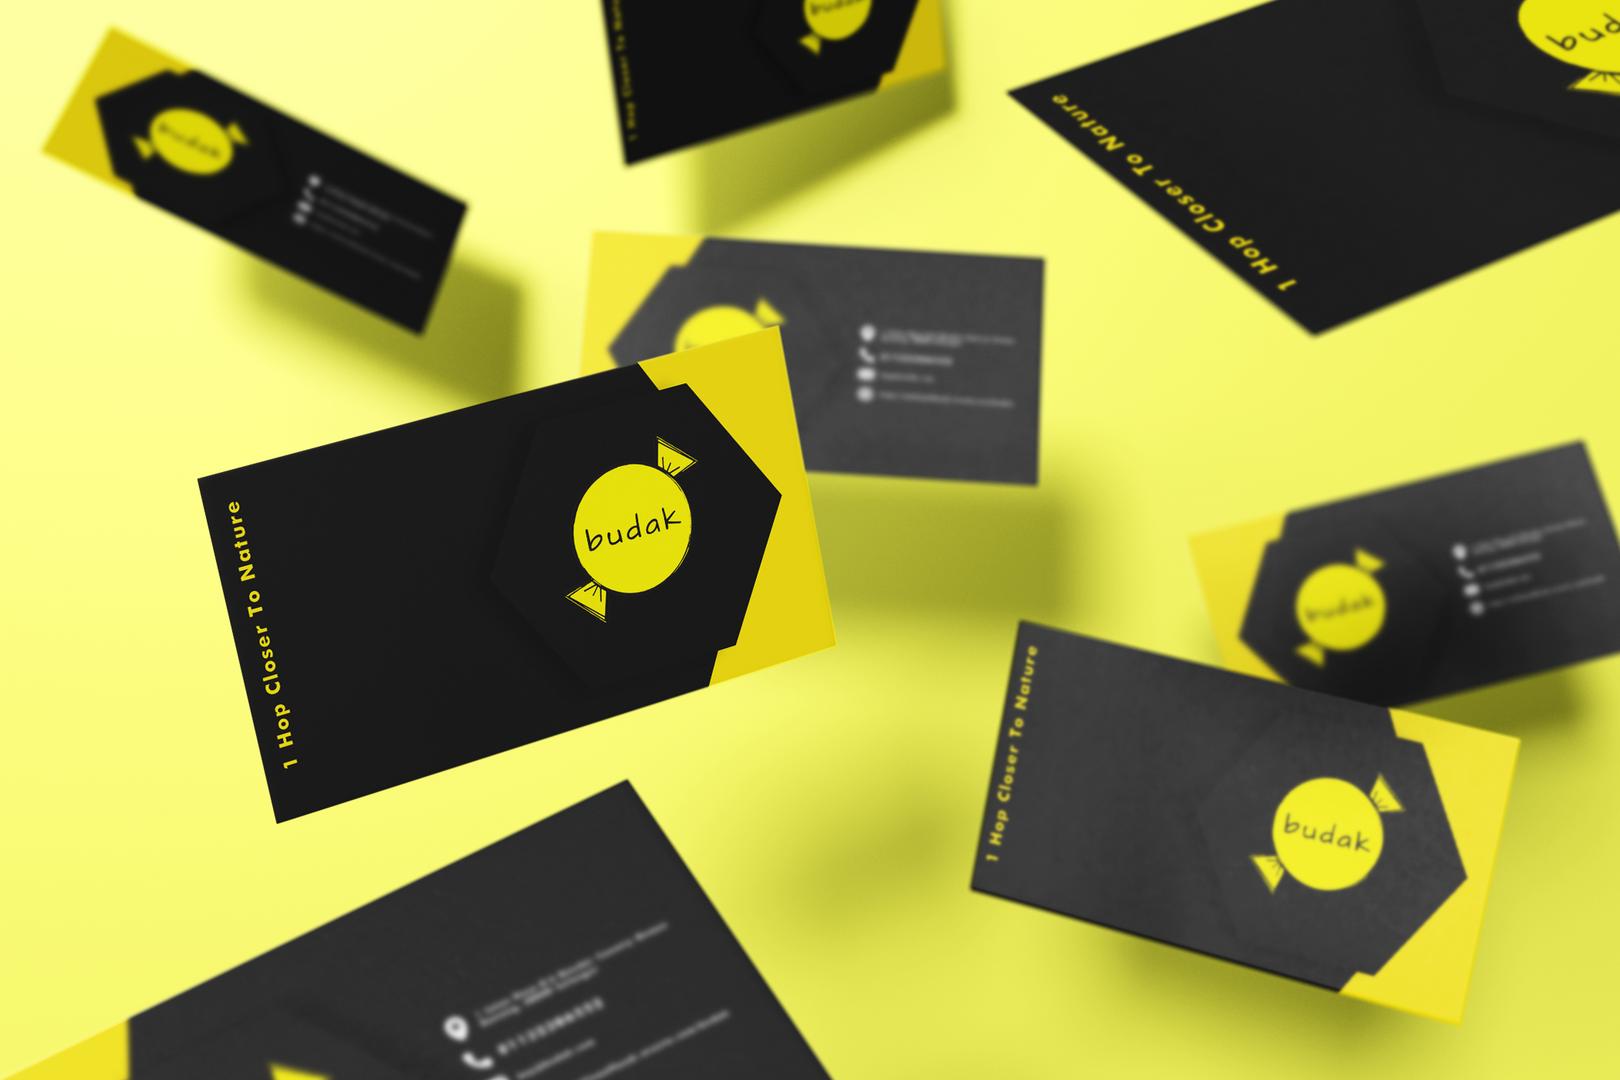 Budak business card